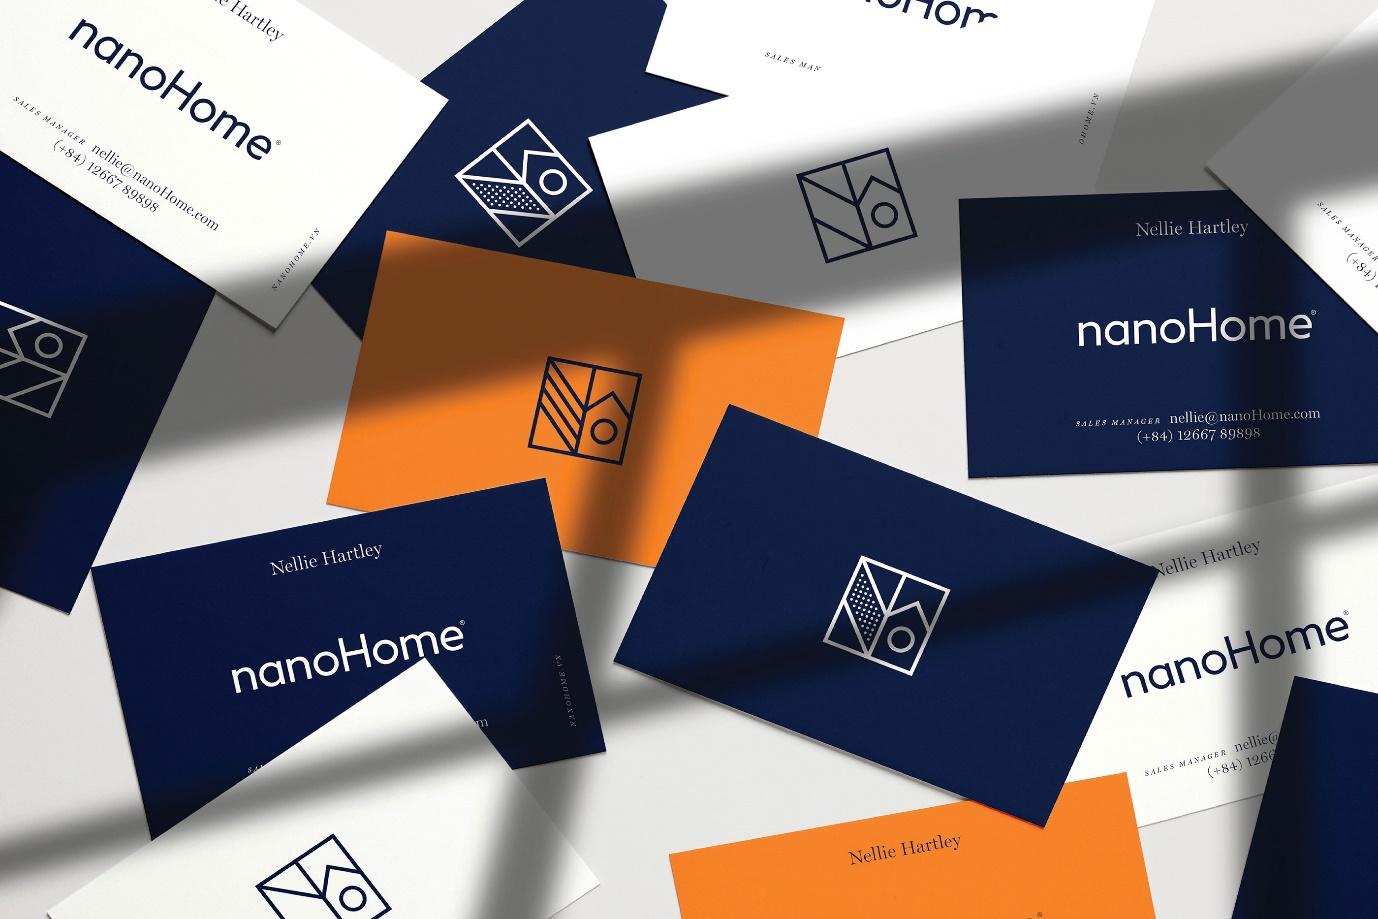 NanoHome